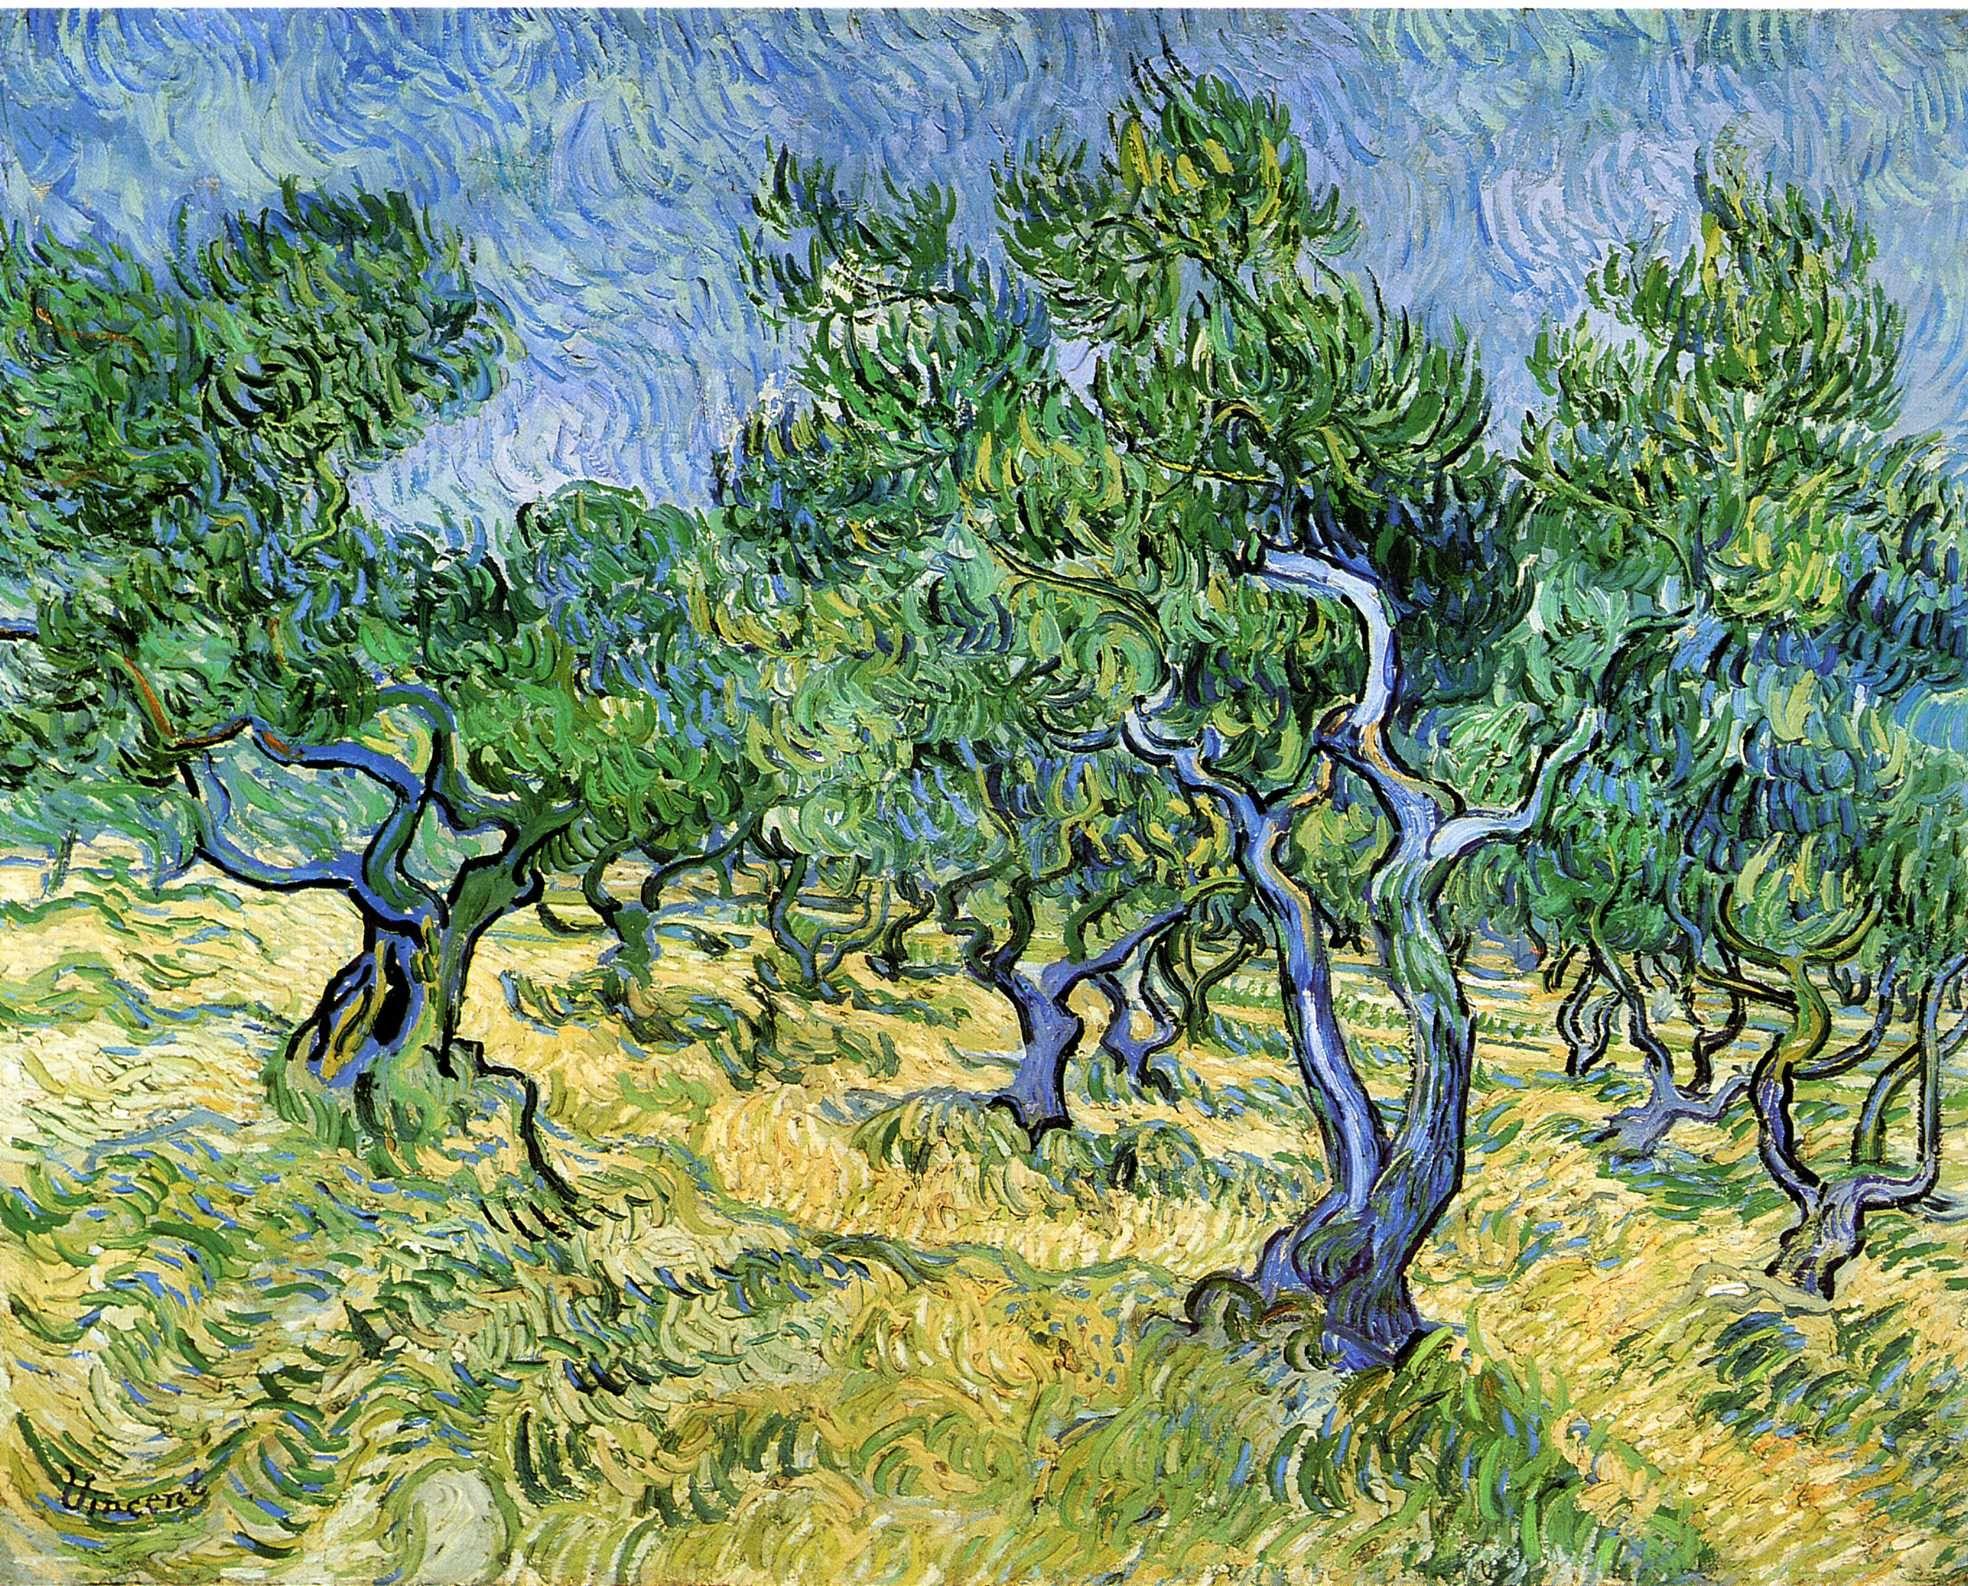 Olive Grove - Vincent van Gogh - 1889 - Place of Creation: Saint-Rémy, Provence, France.............#GT